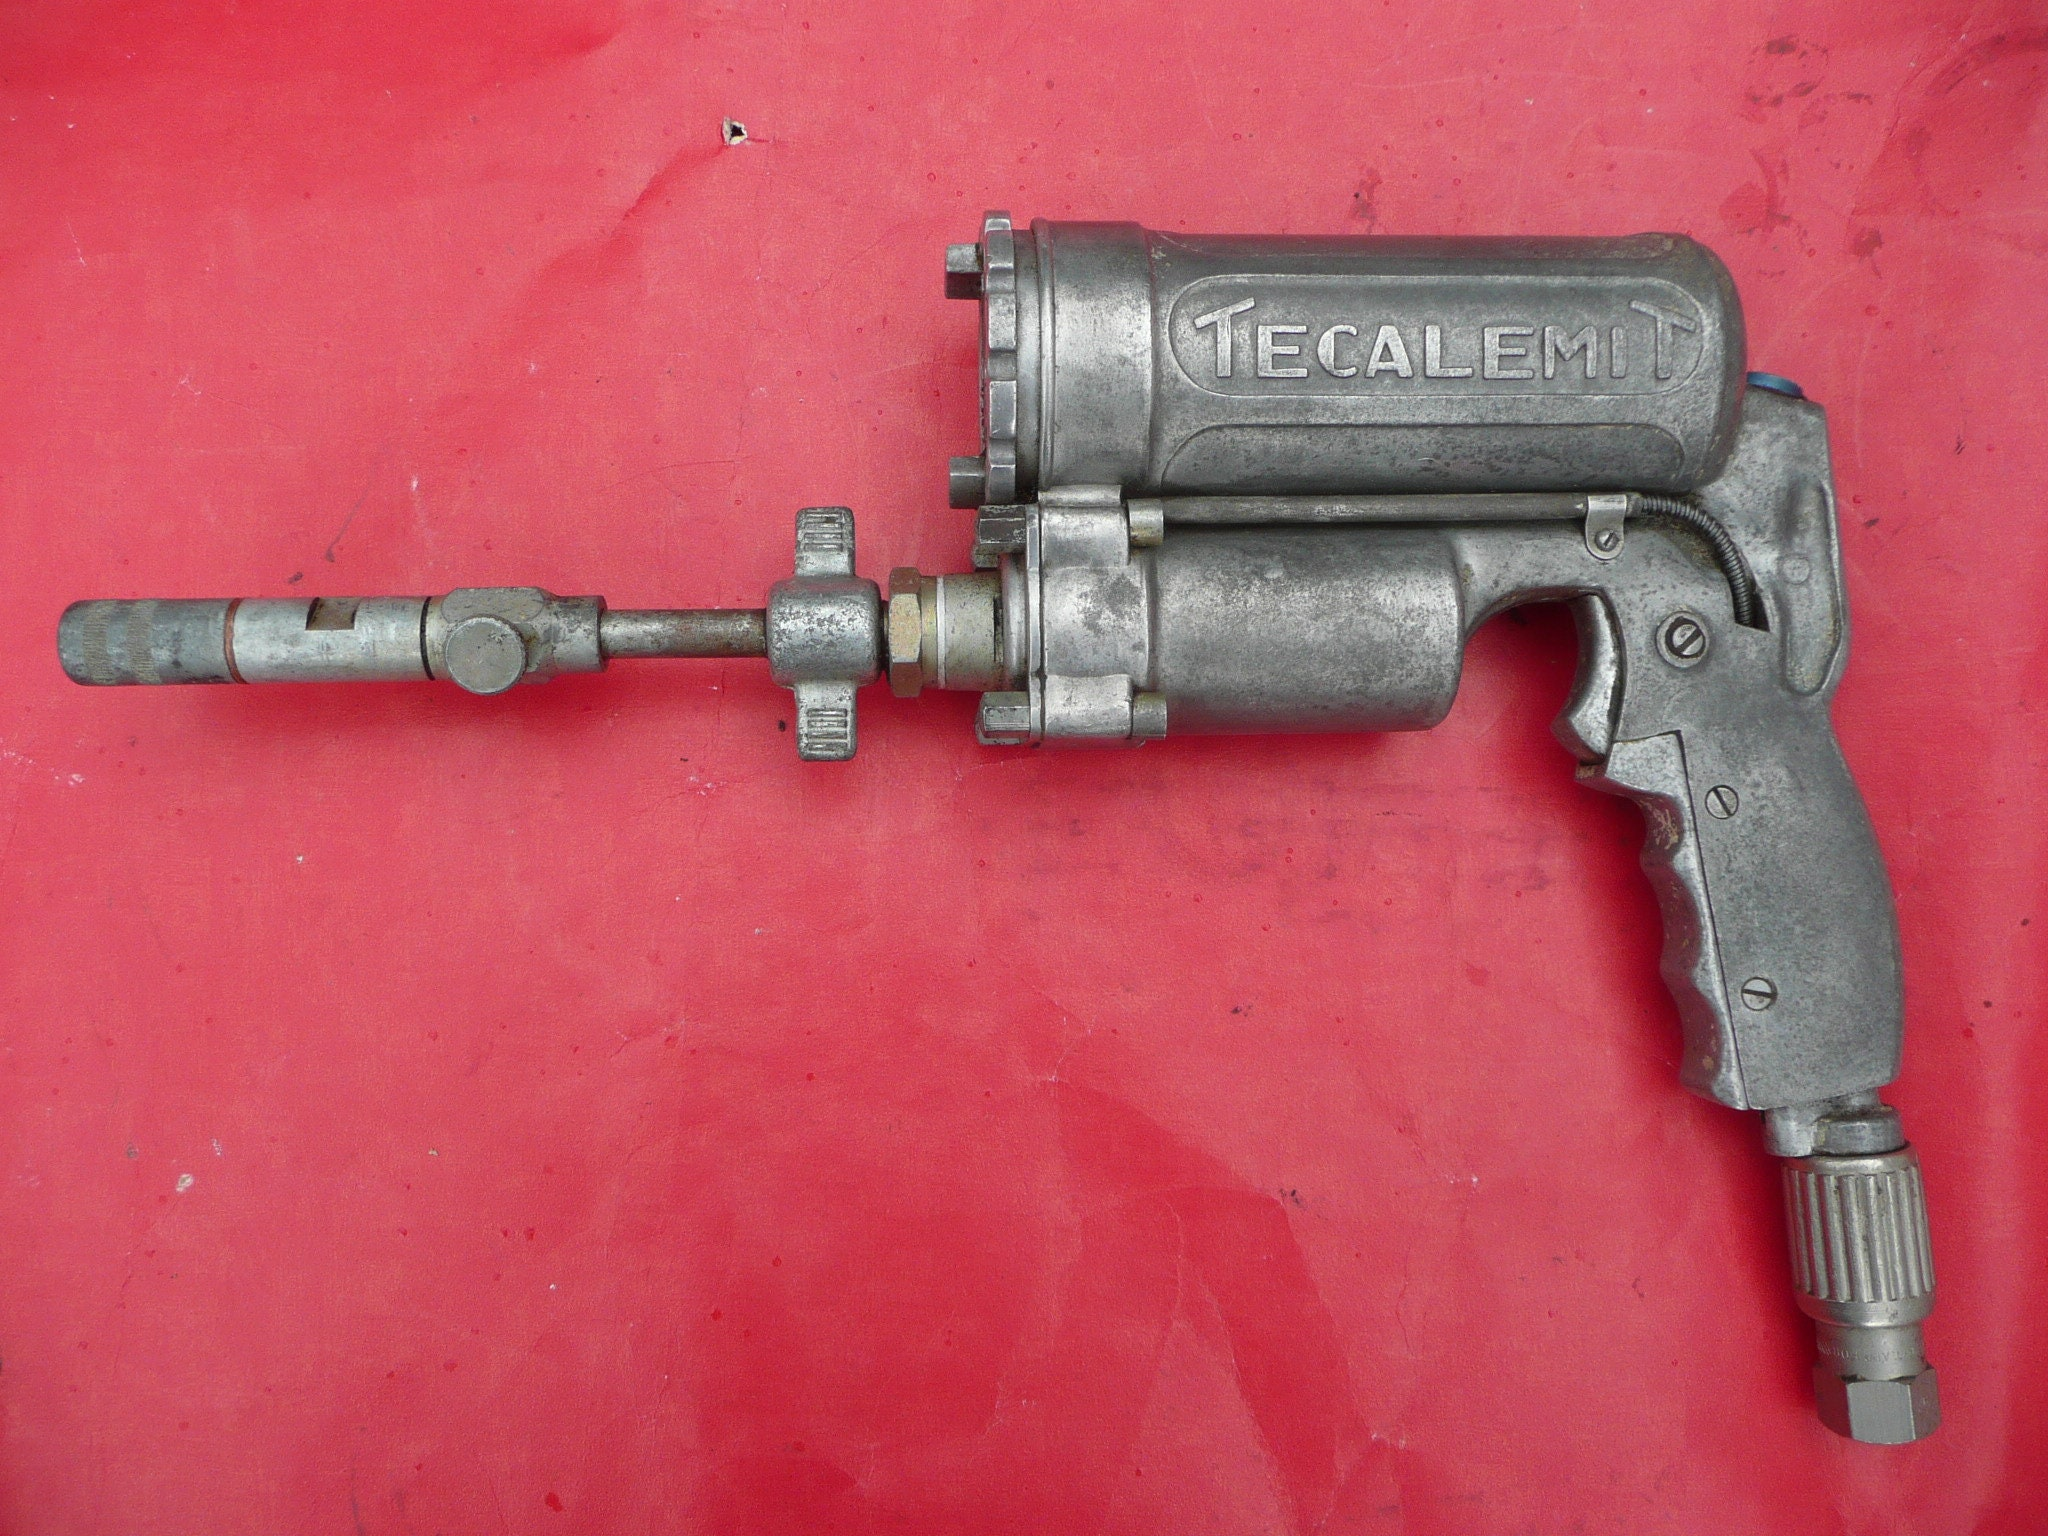 Vintage Industrial Tool 1950s Space Age Atomic Look Cast Aluminium Raygun Sci Fi Dan Dare Look Man Cave Decor